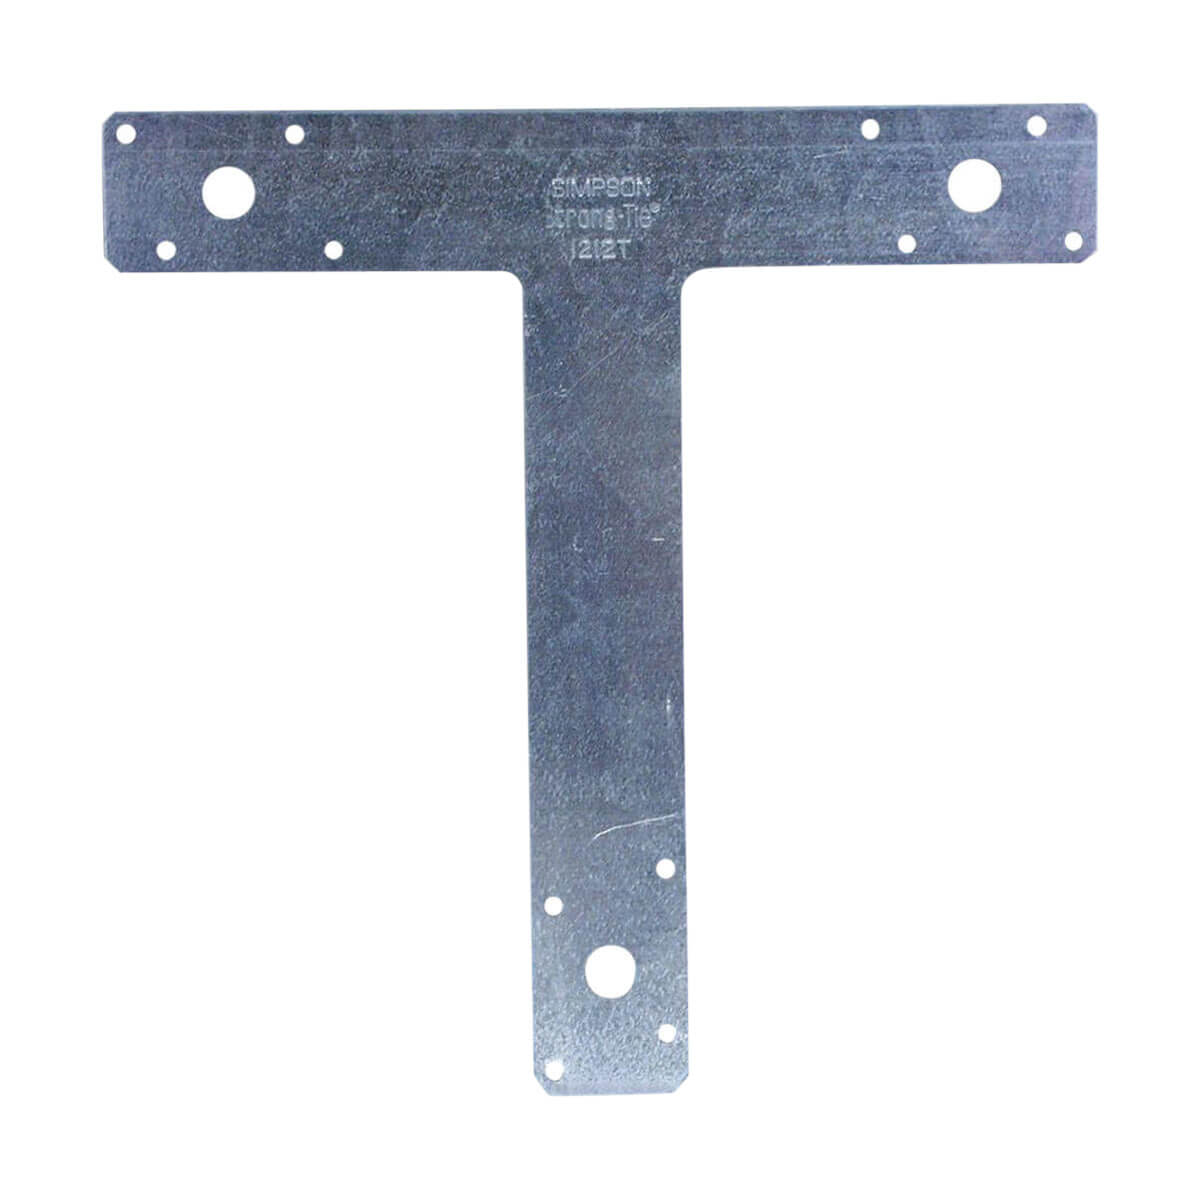 T Strap - 14 Gauge - 12-in x 12-in